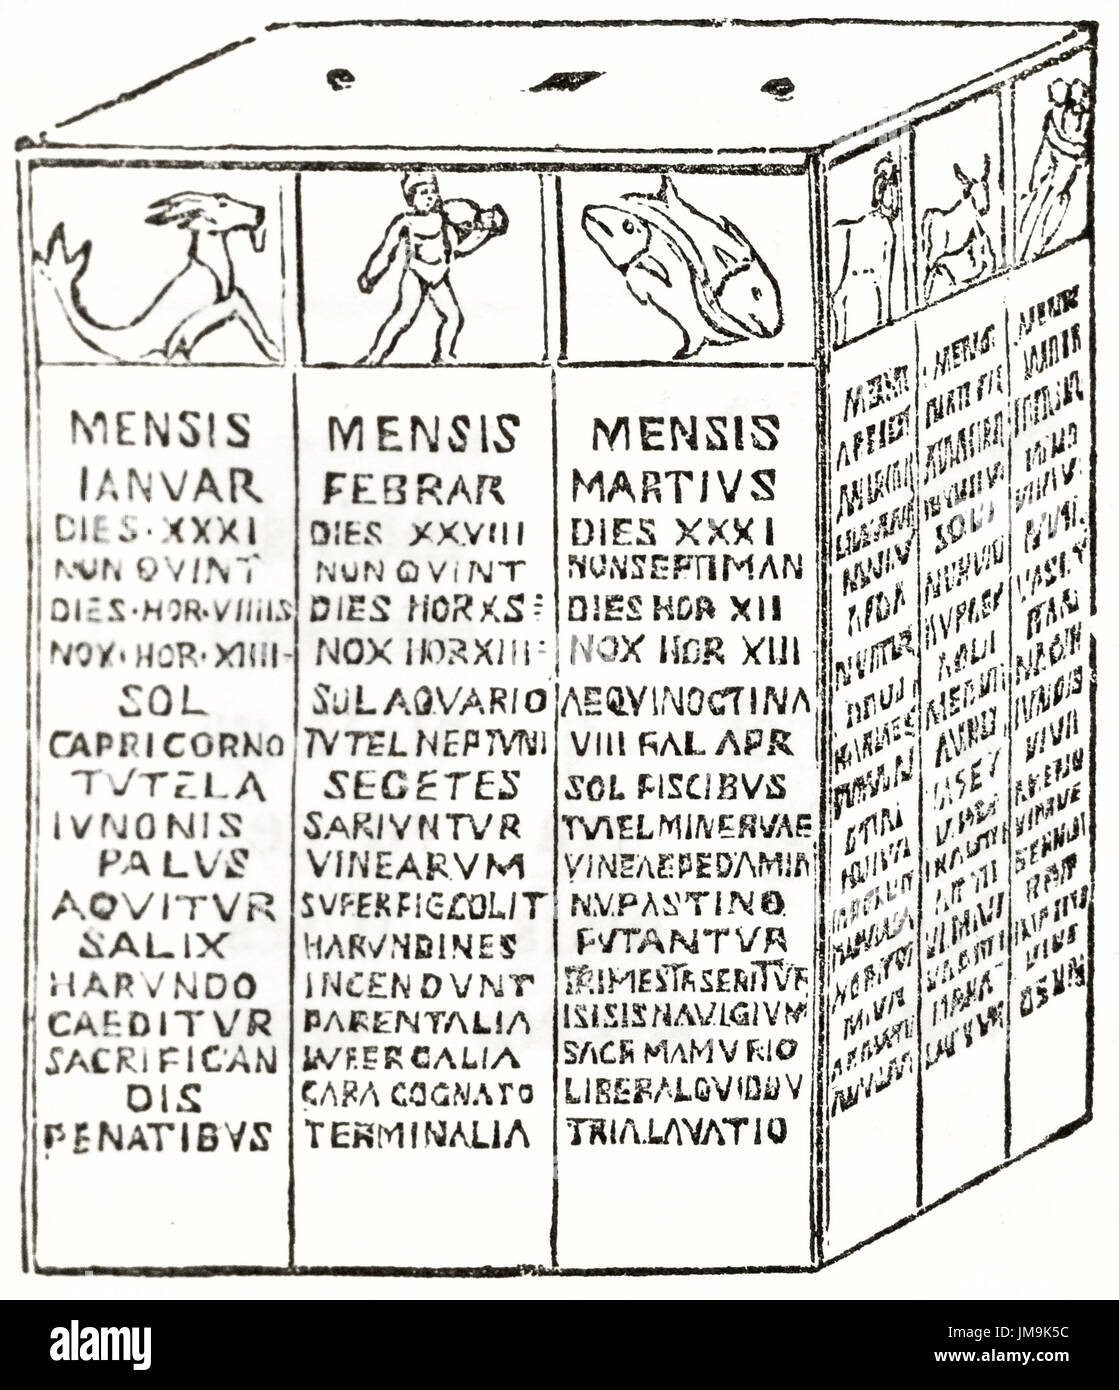 Roman Calendar.Old Illustration Of A Roman Calendar By Unidentified Author Stock